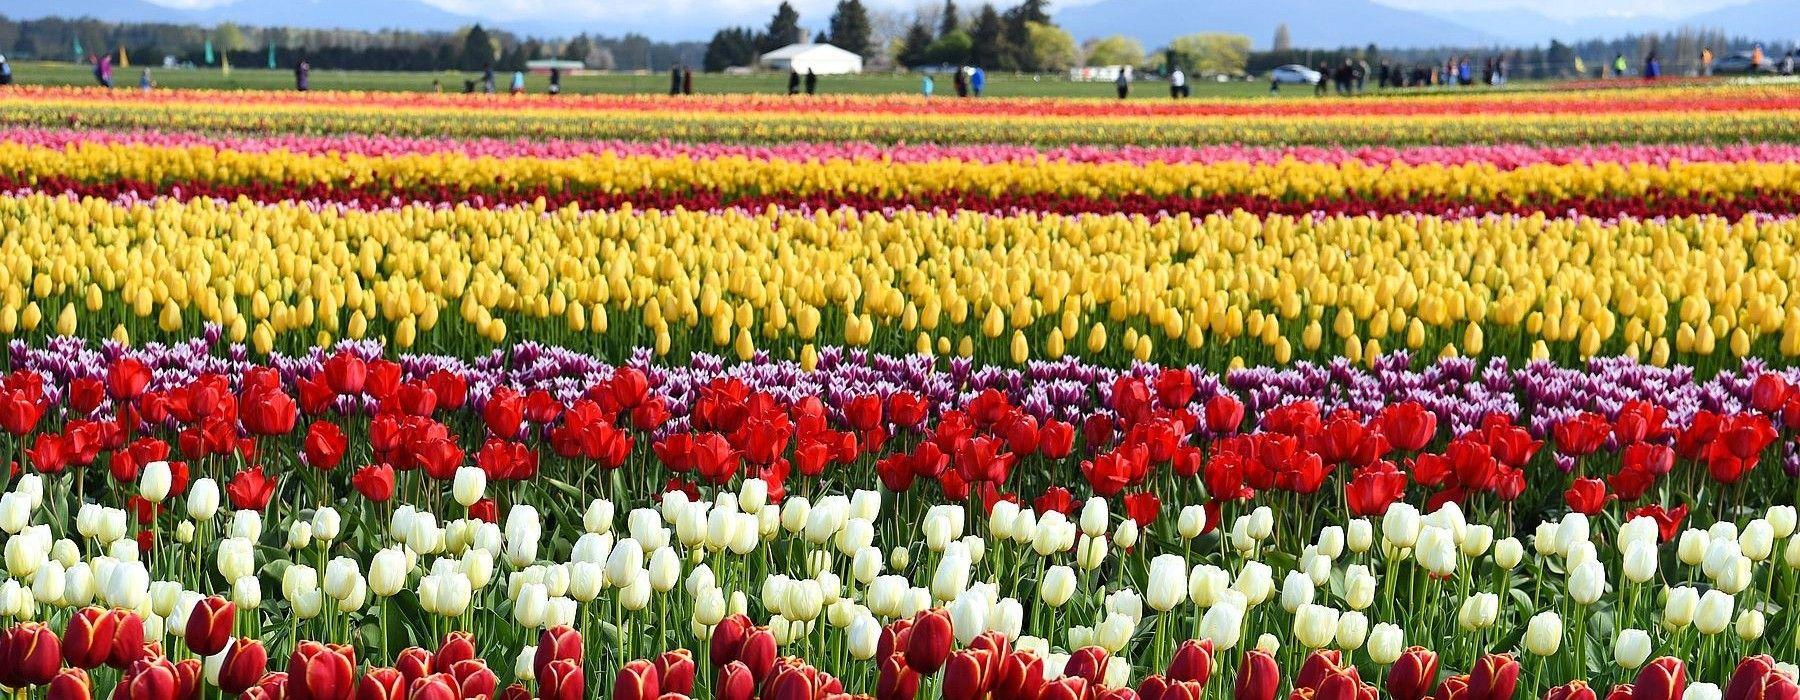 Tulip Festival Interactive Map Skagit Valley Tulip Festival Tulip Festival Morocco